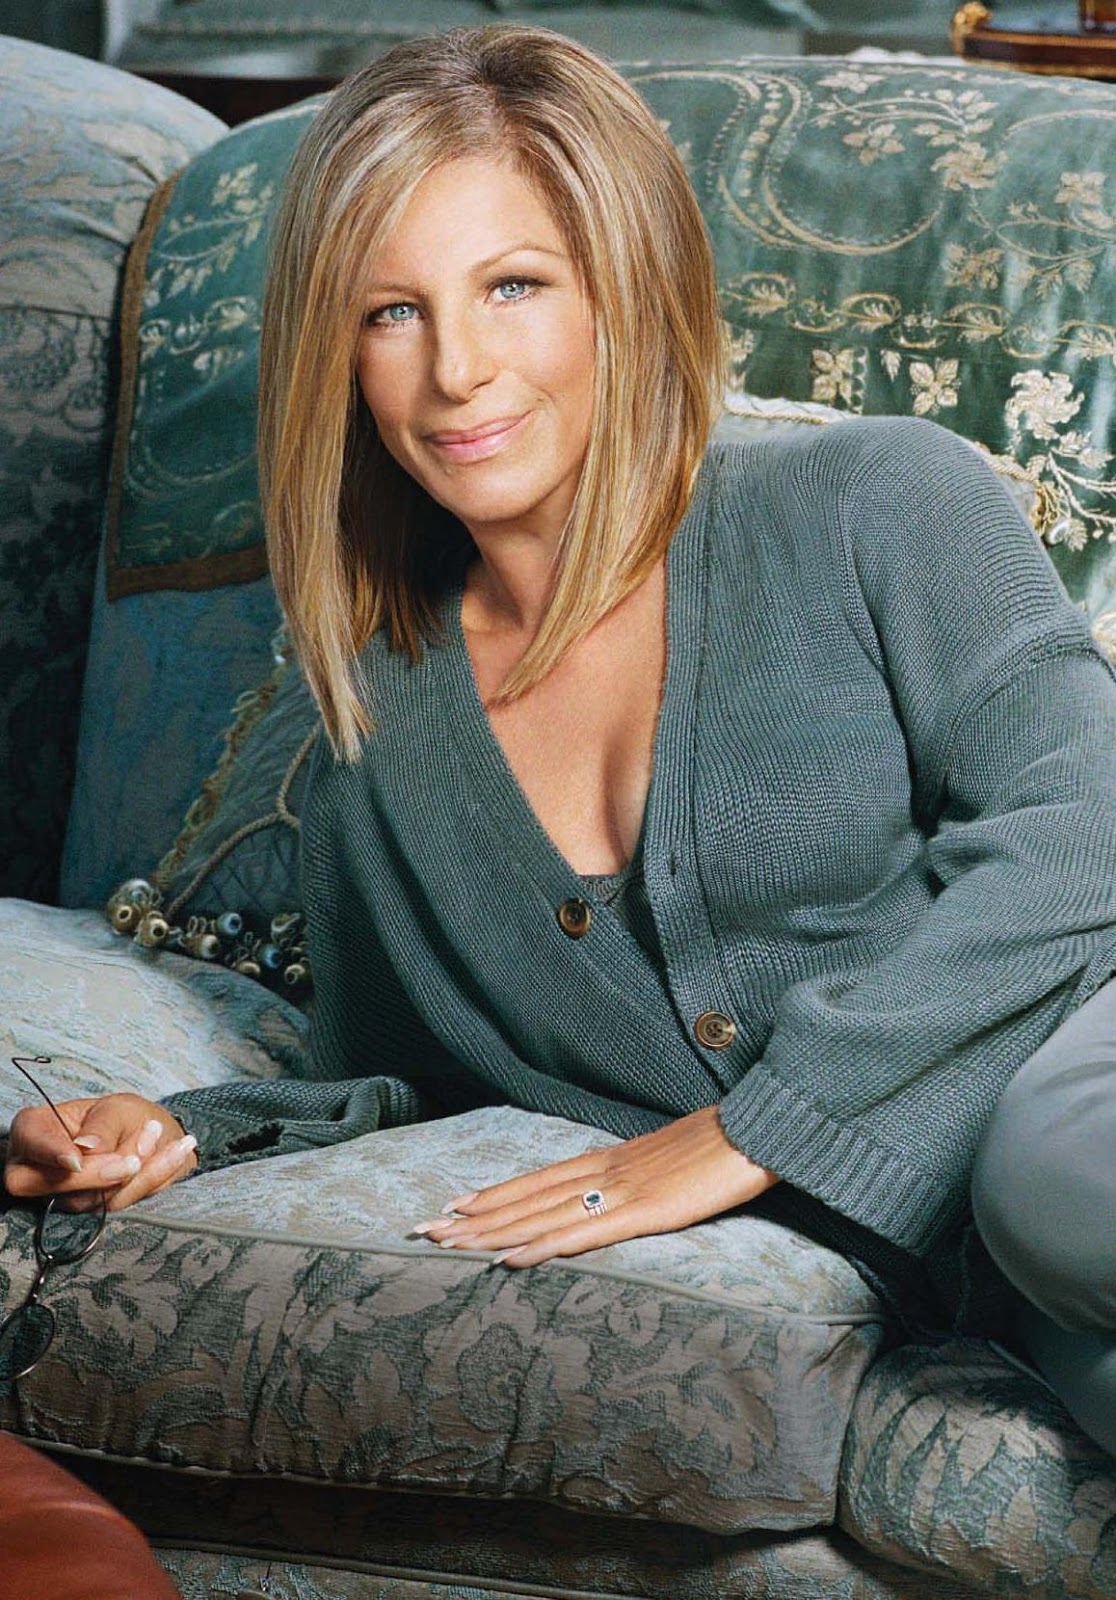 http://3.bp.blogspot.com/_MtcG6Tn8mk8/TSJCtHcFyuI/AAAAAAAABSI/Nc_LXaSyBEc/s1600/Barbra-Streisand-barbra-streisand-8952593-1158-1660.jpg